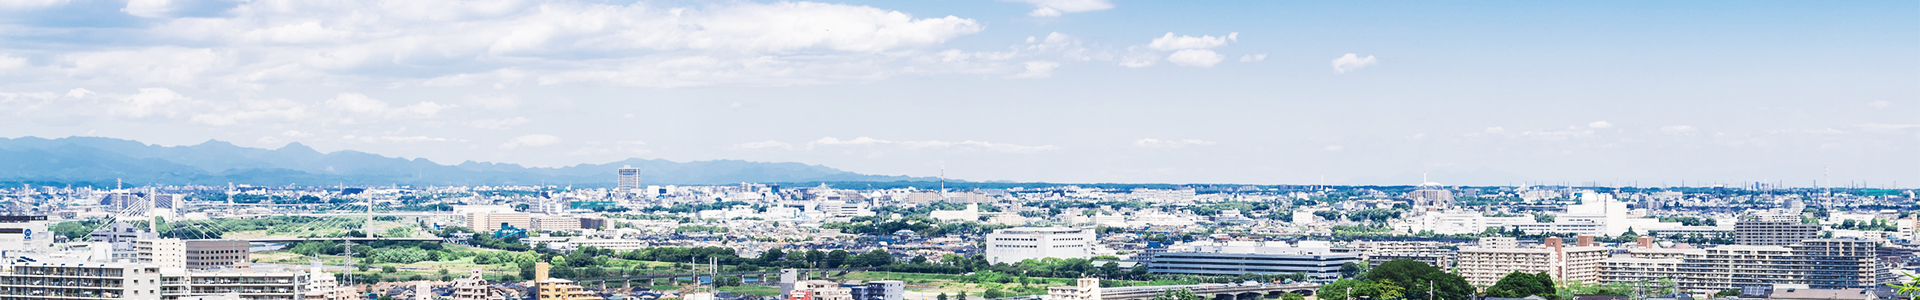 写真:青空